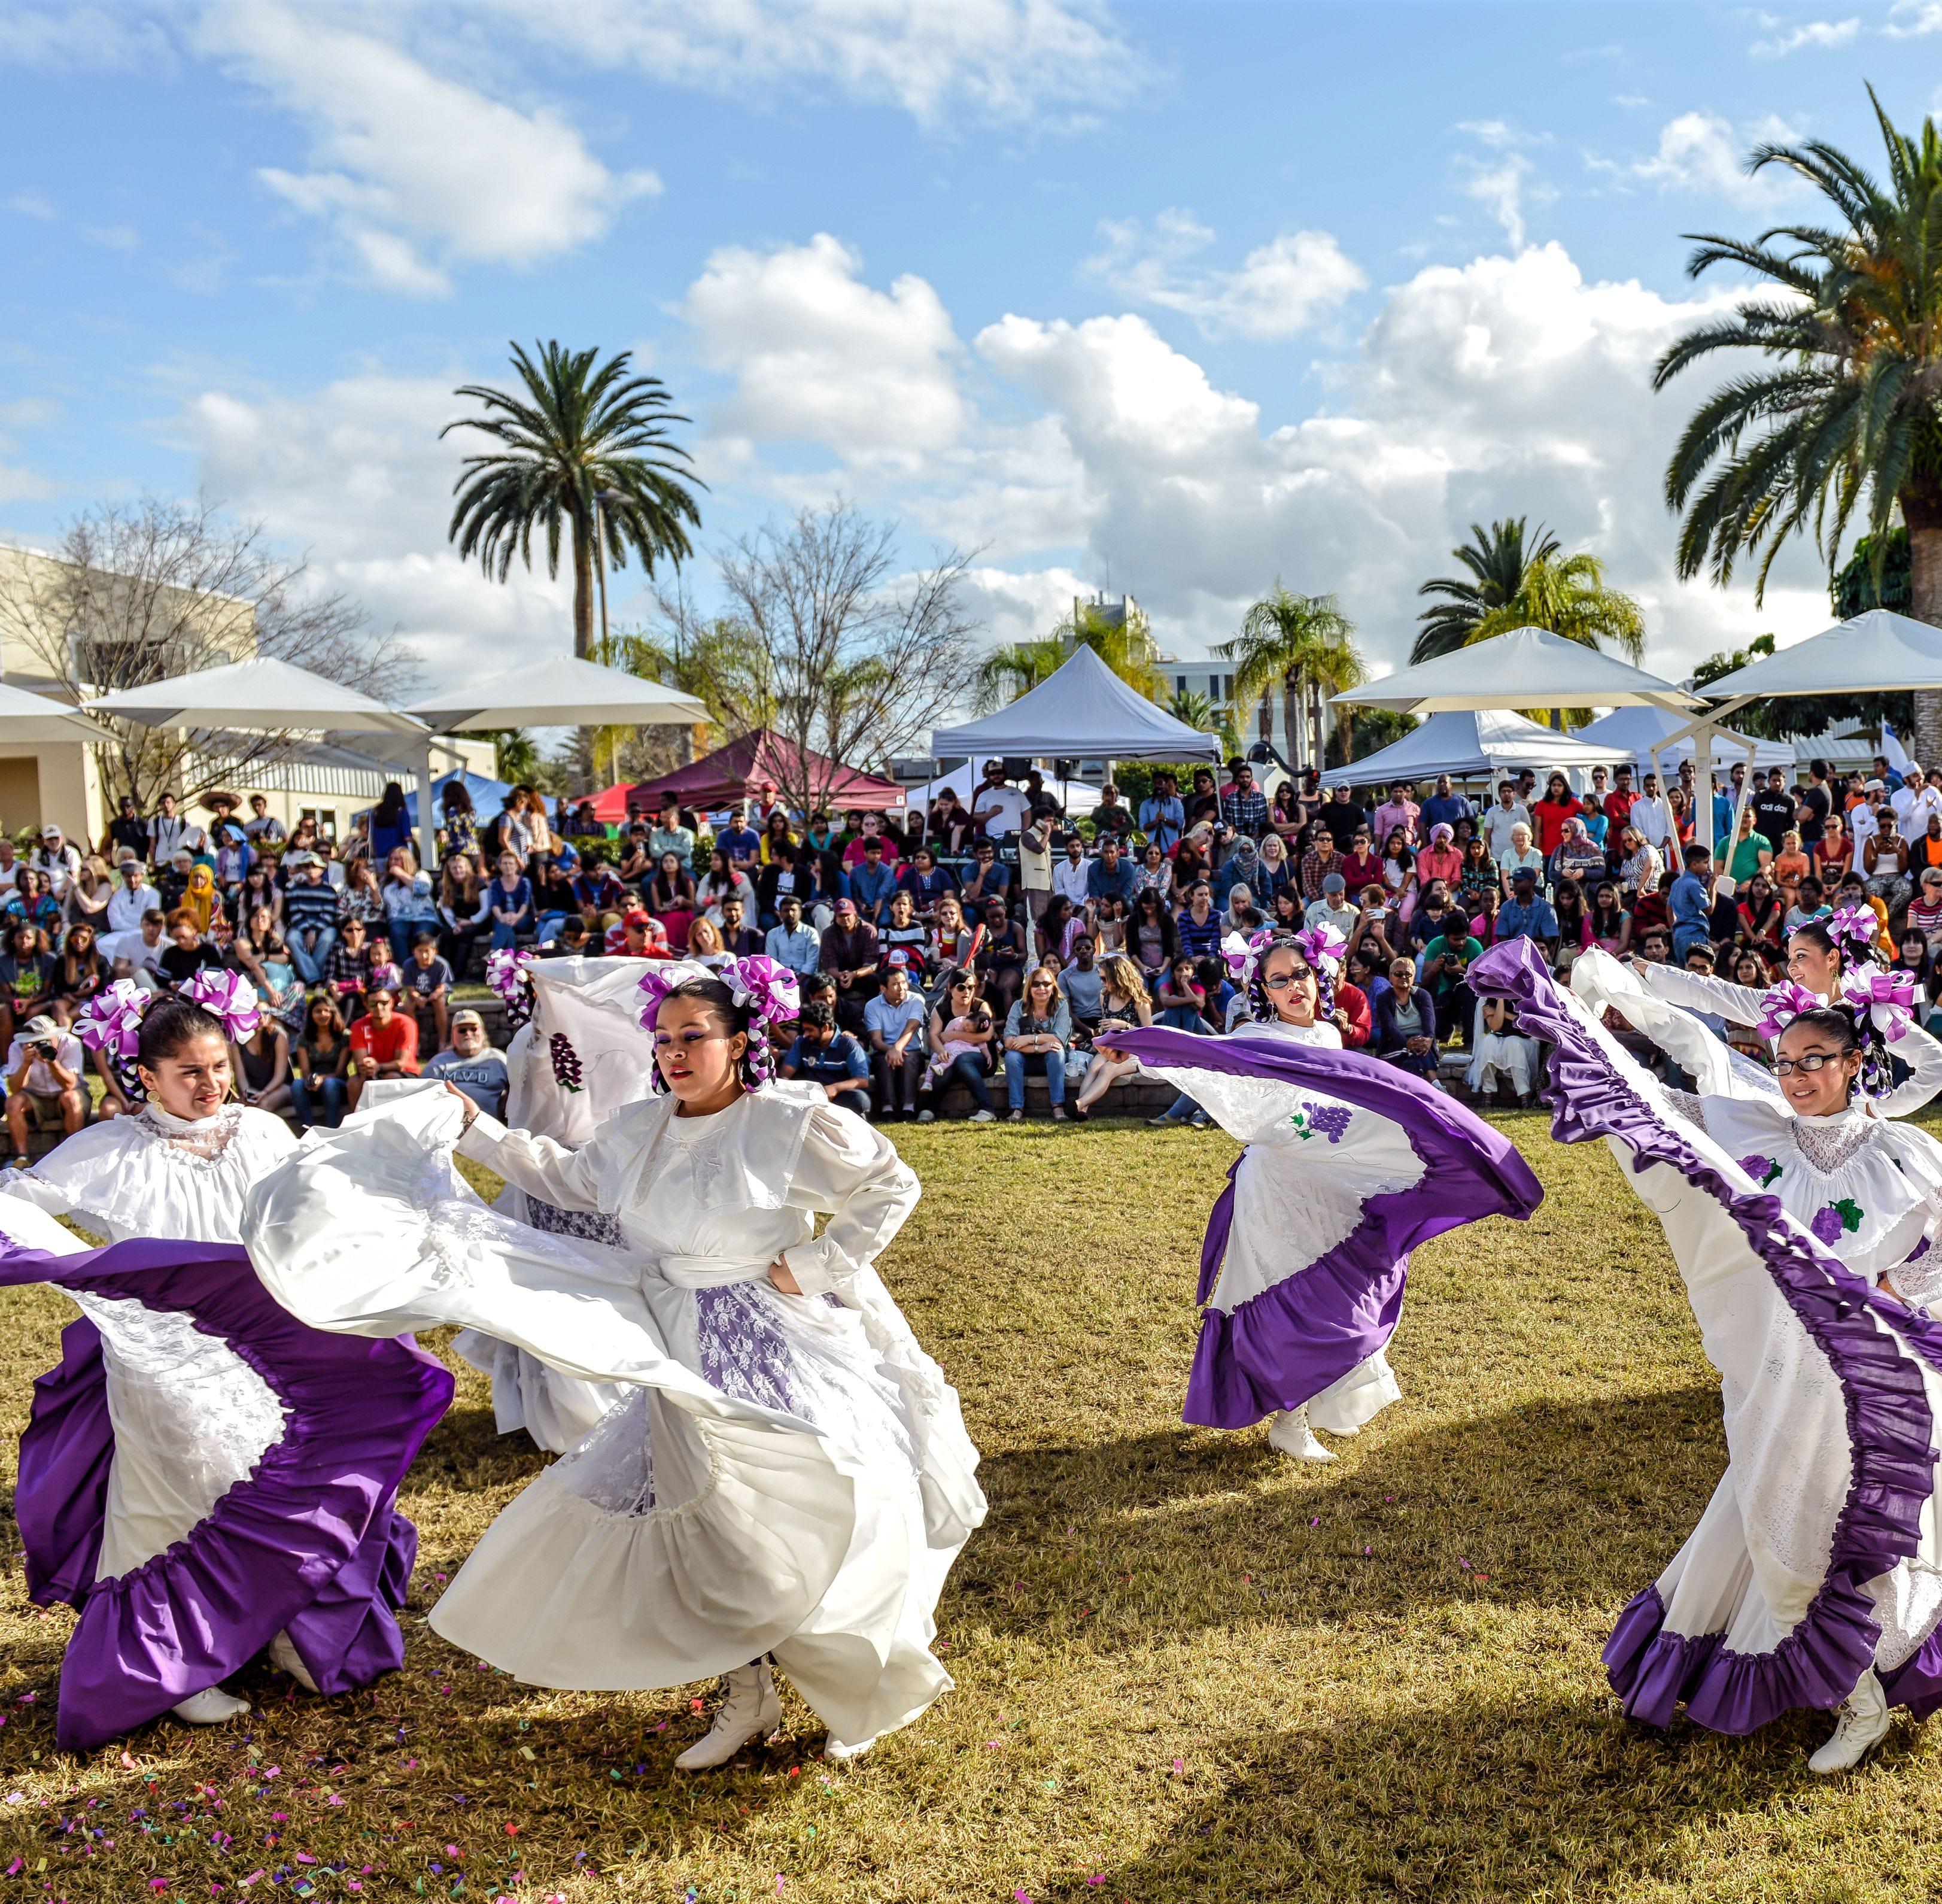 Take a trip around the world at Florida Tech's International Festival